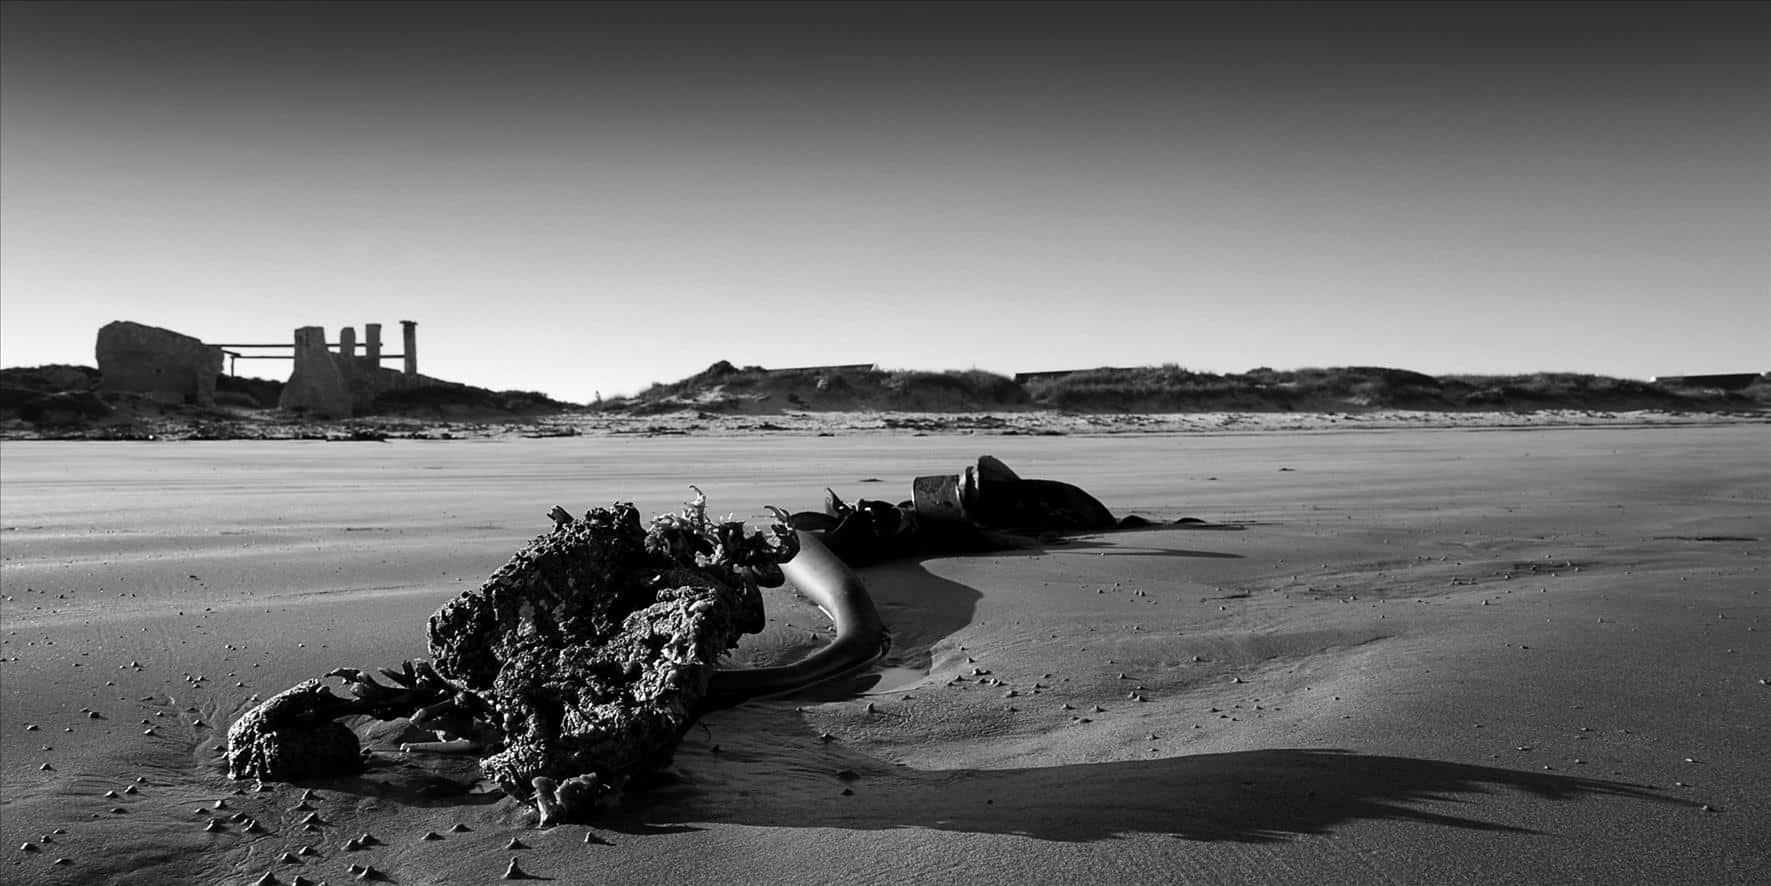 sea shore seaweeds